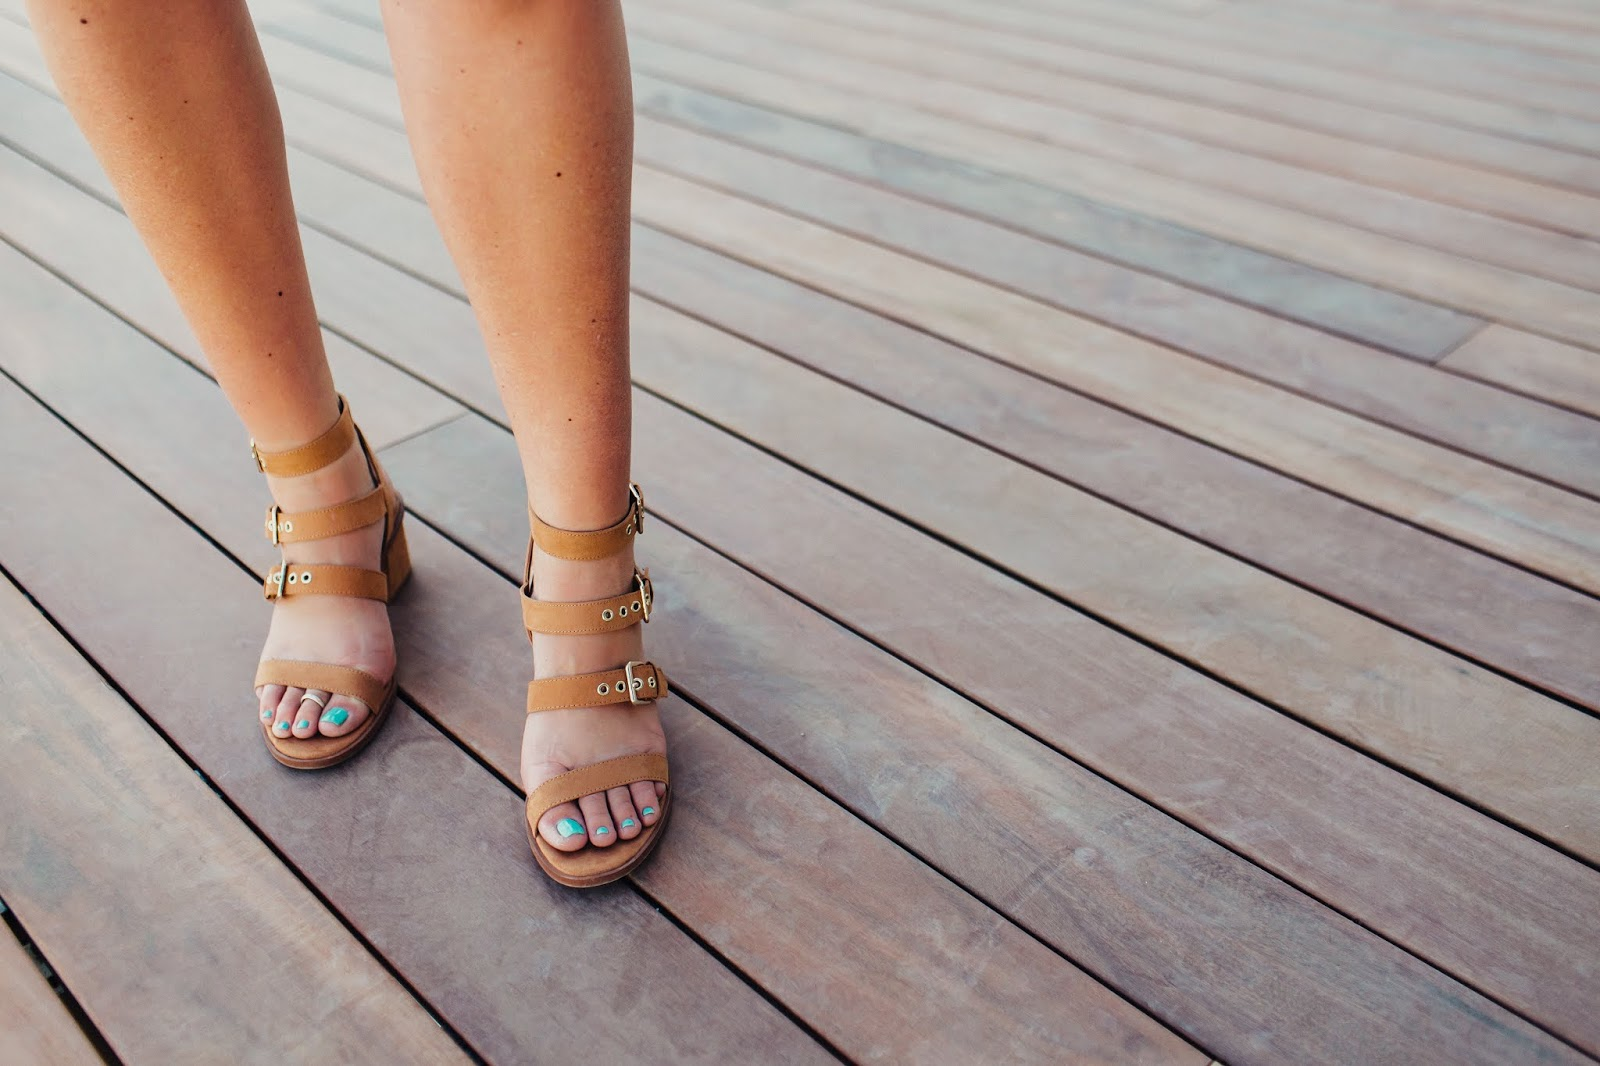 Summer Sandals, ASOS Sandals